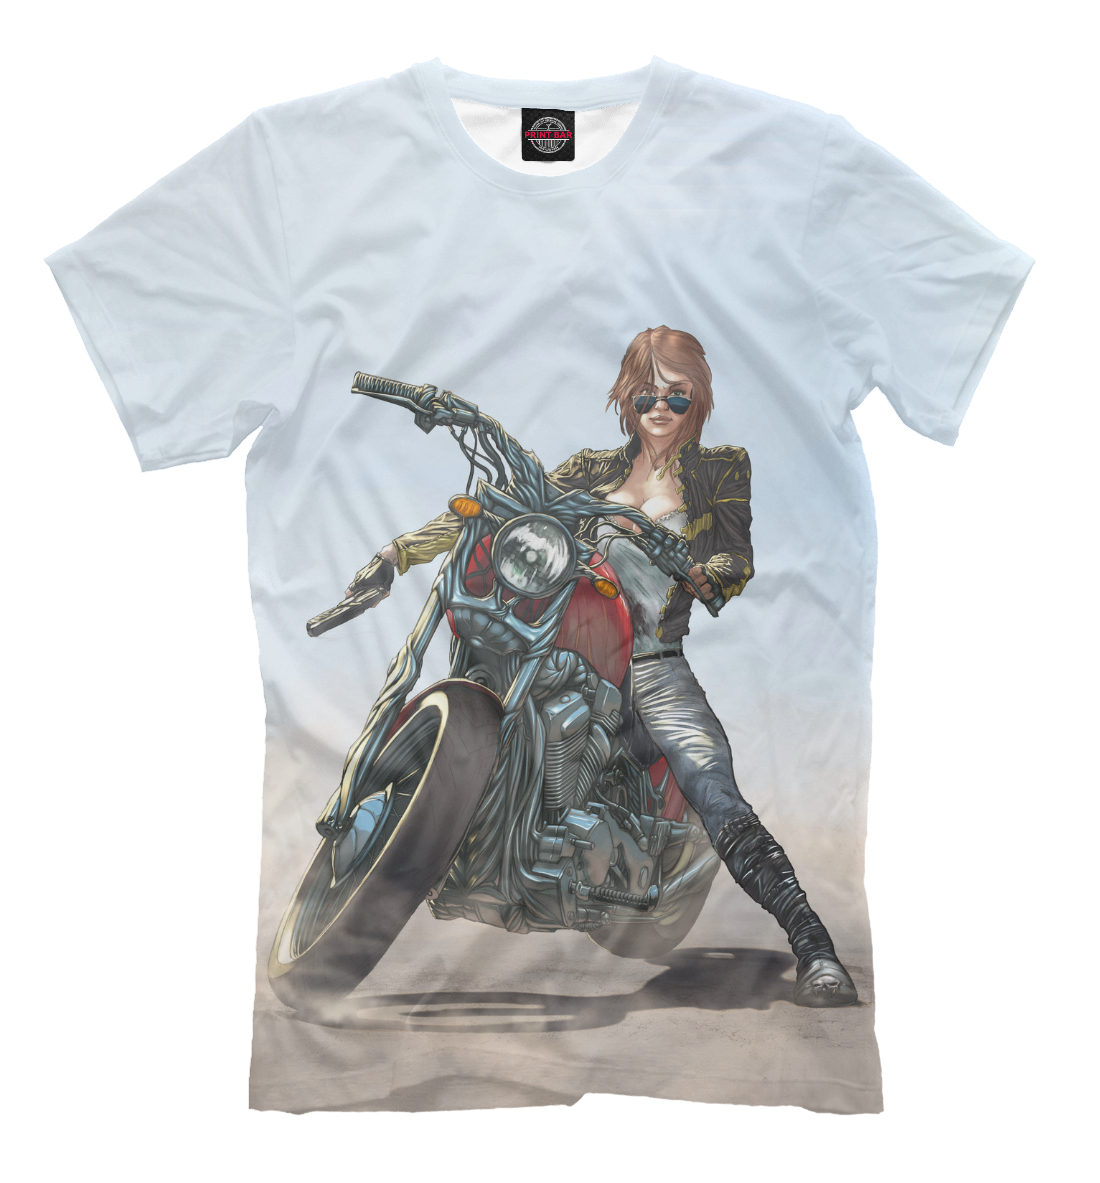 Купить Девушка на мотоцикле, Printbar, Футболки, MTR-179002-fut-2